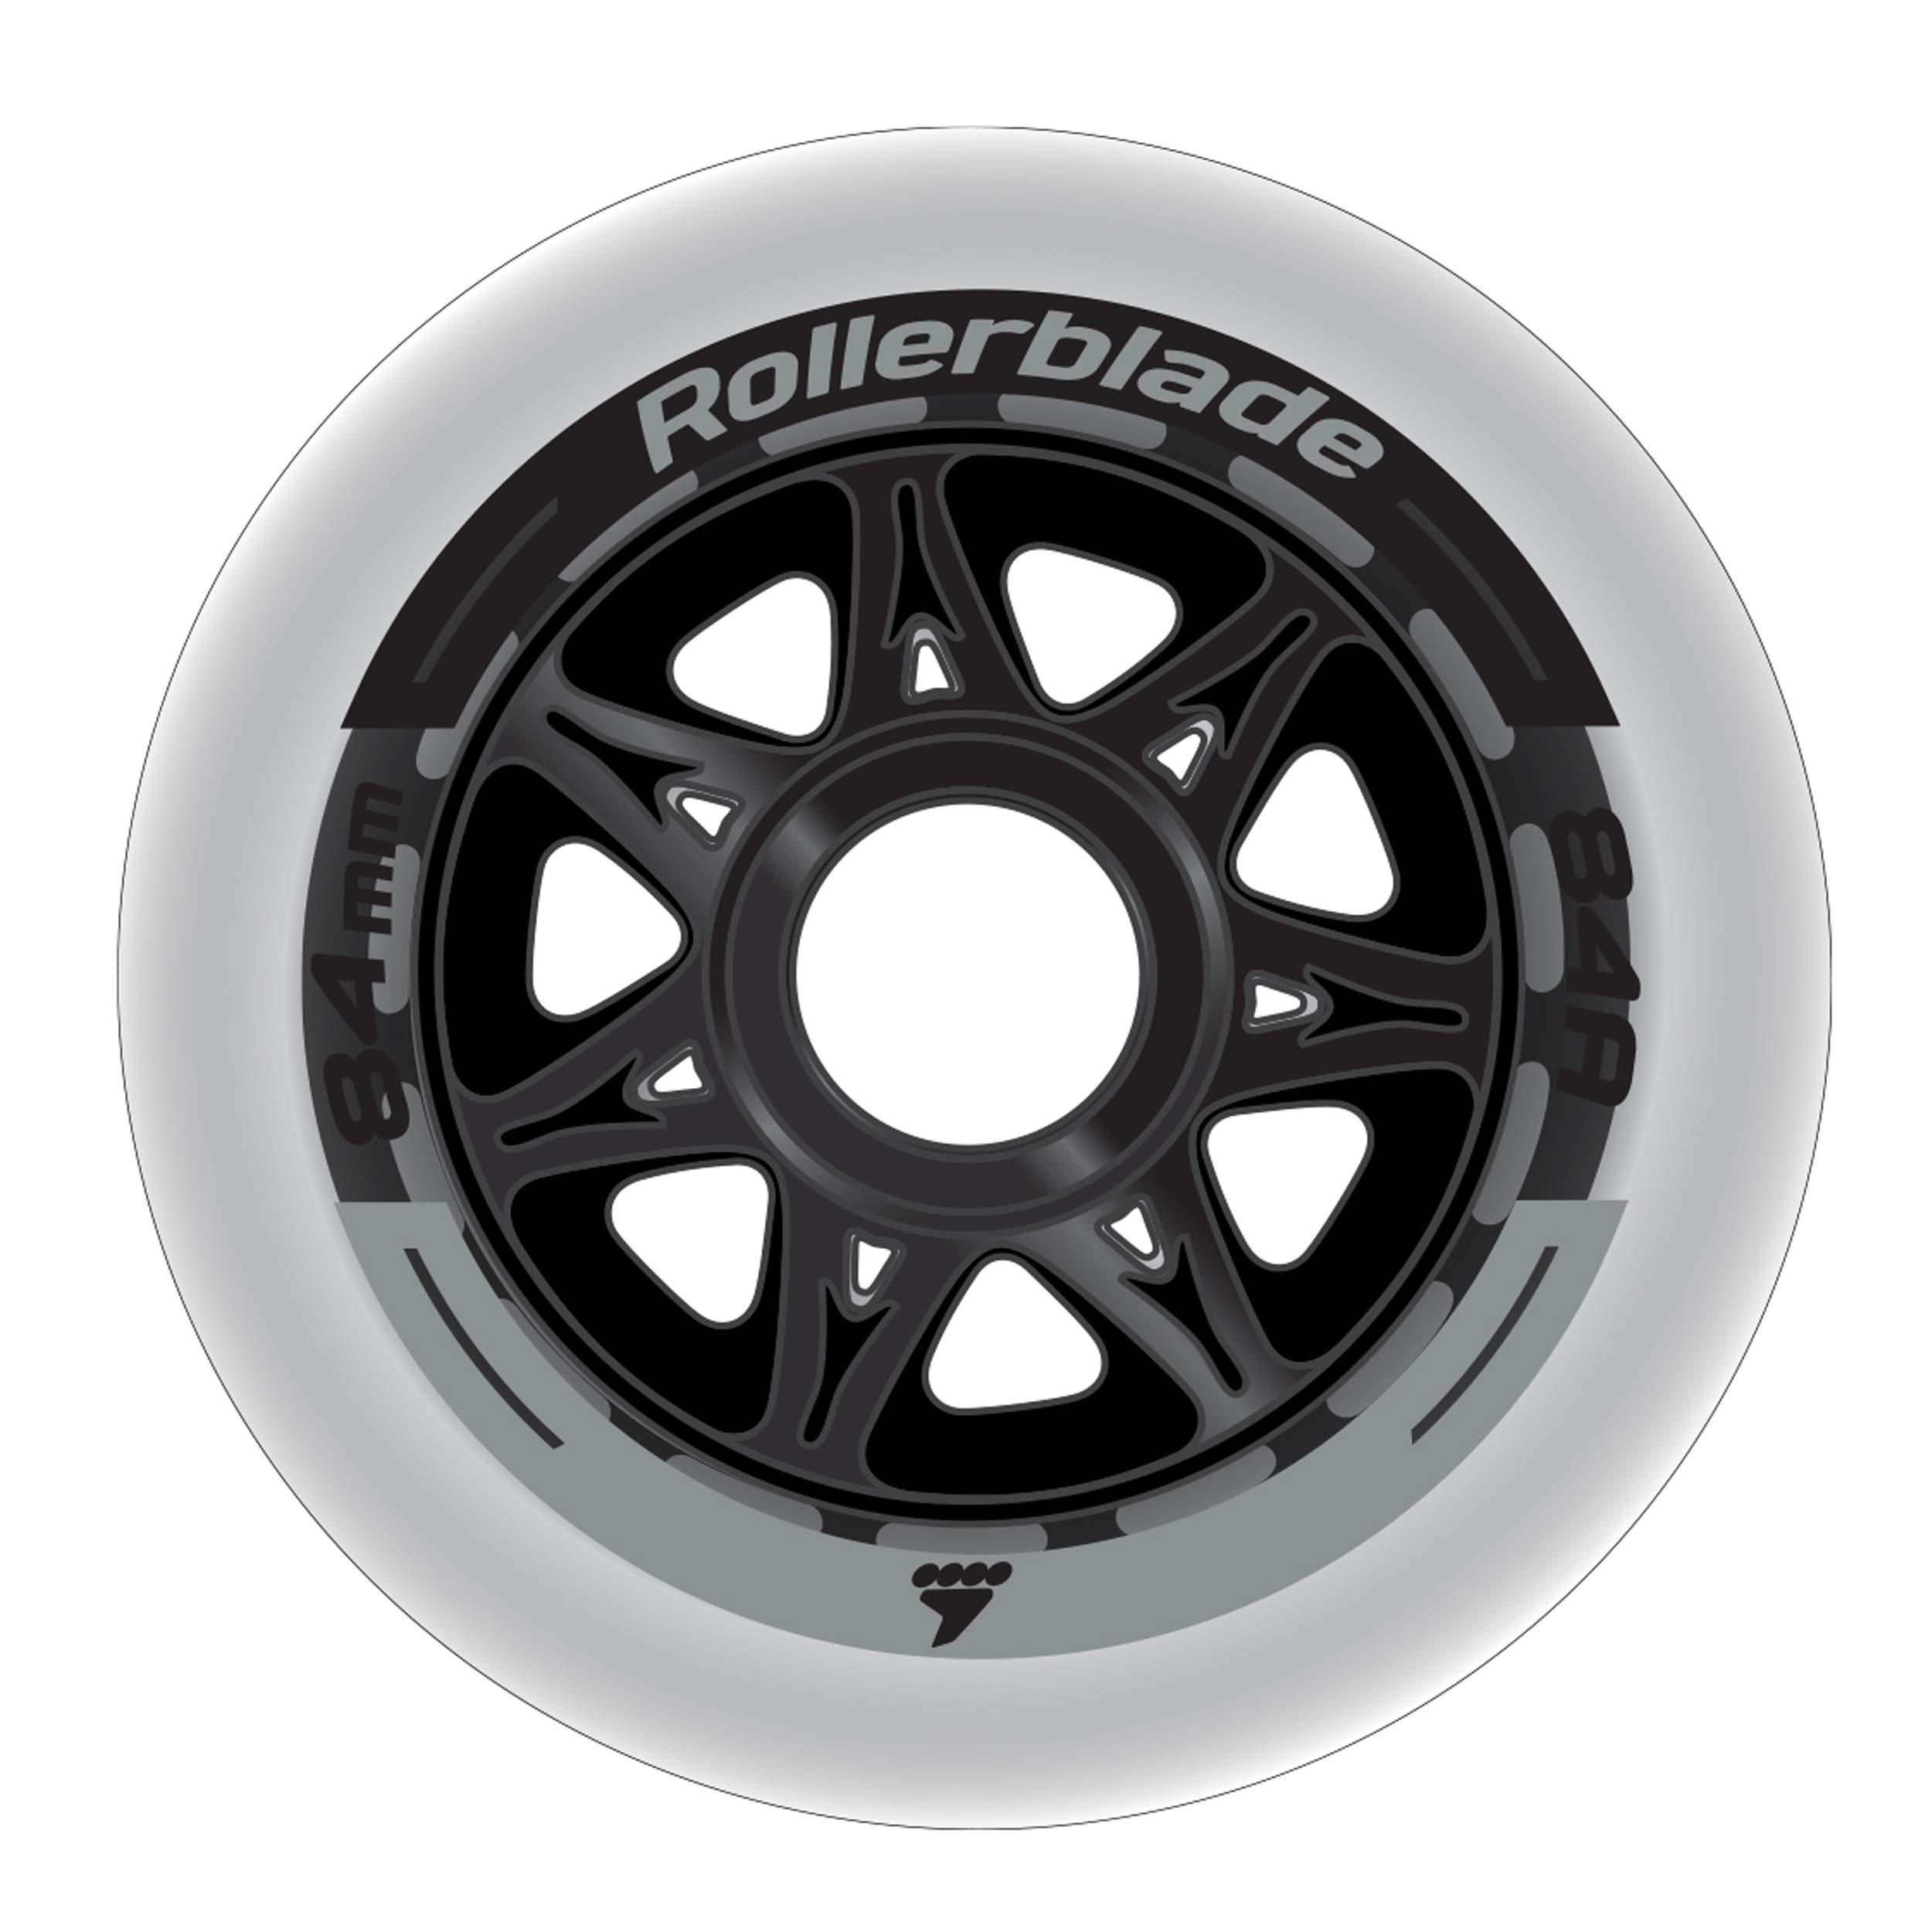 Rollerblade 84mm 84A Ruedas